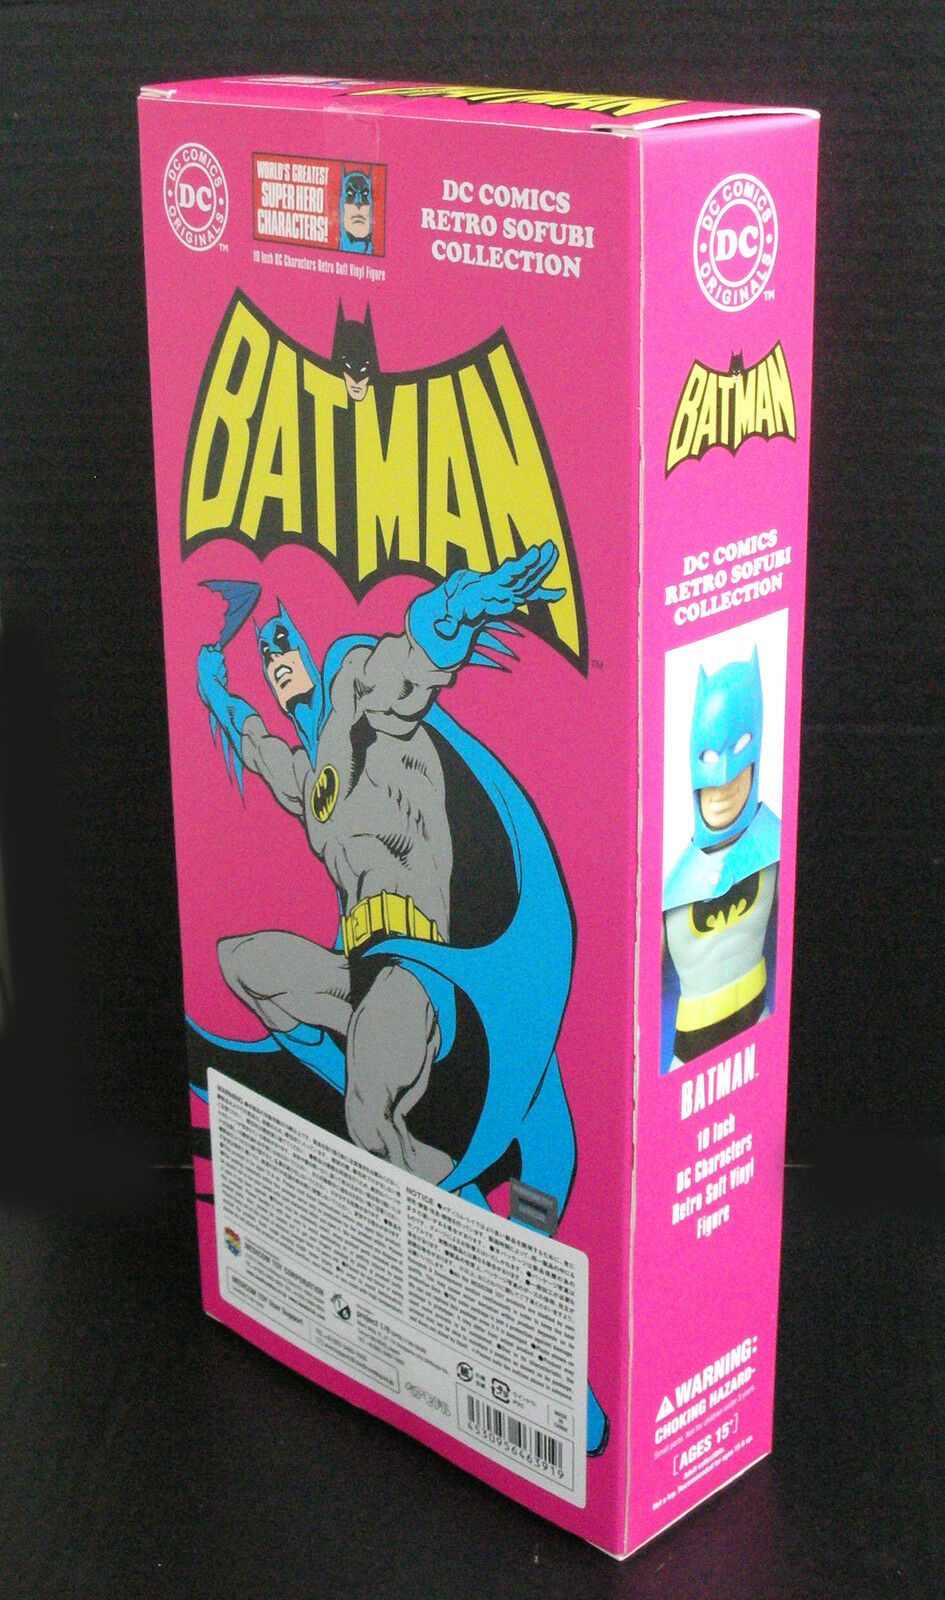 DC Comics Retro Sofubi Collection Batman Soft Vinyl Toy Toy Toy Medicom 25 cm c2f7c0